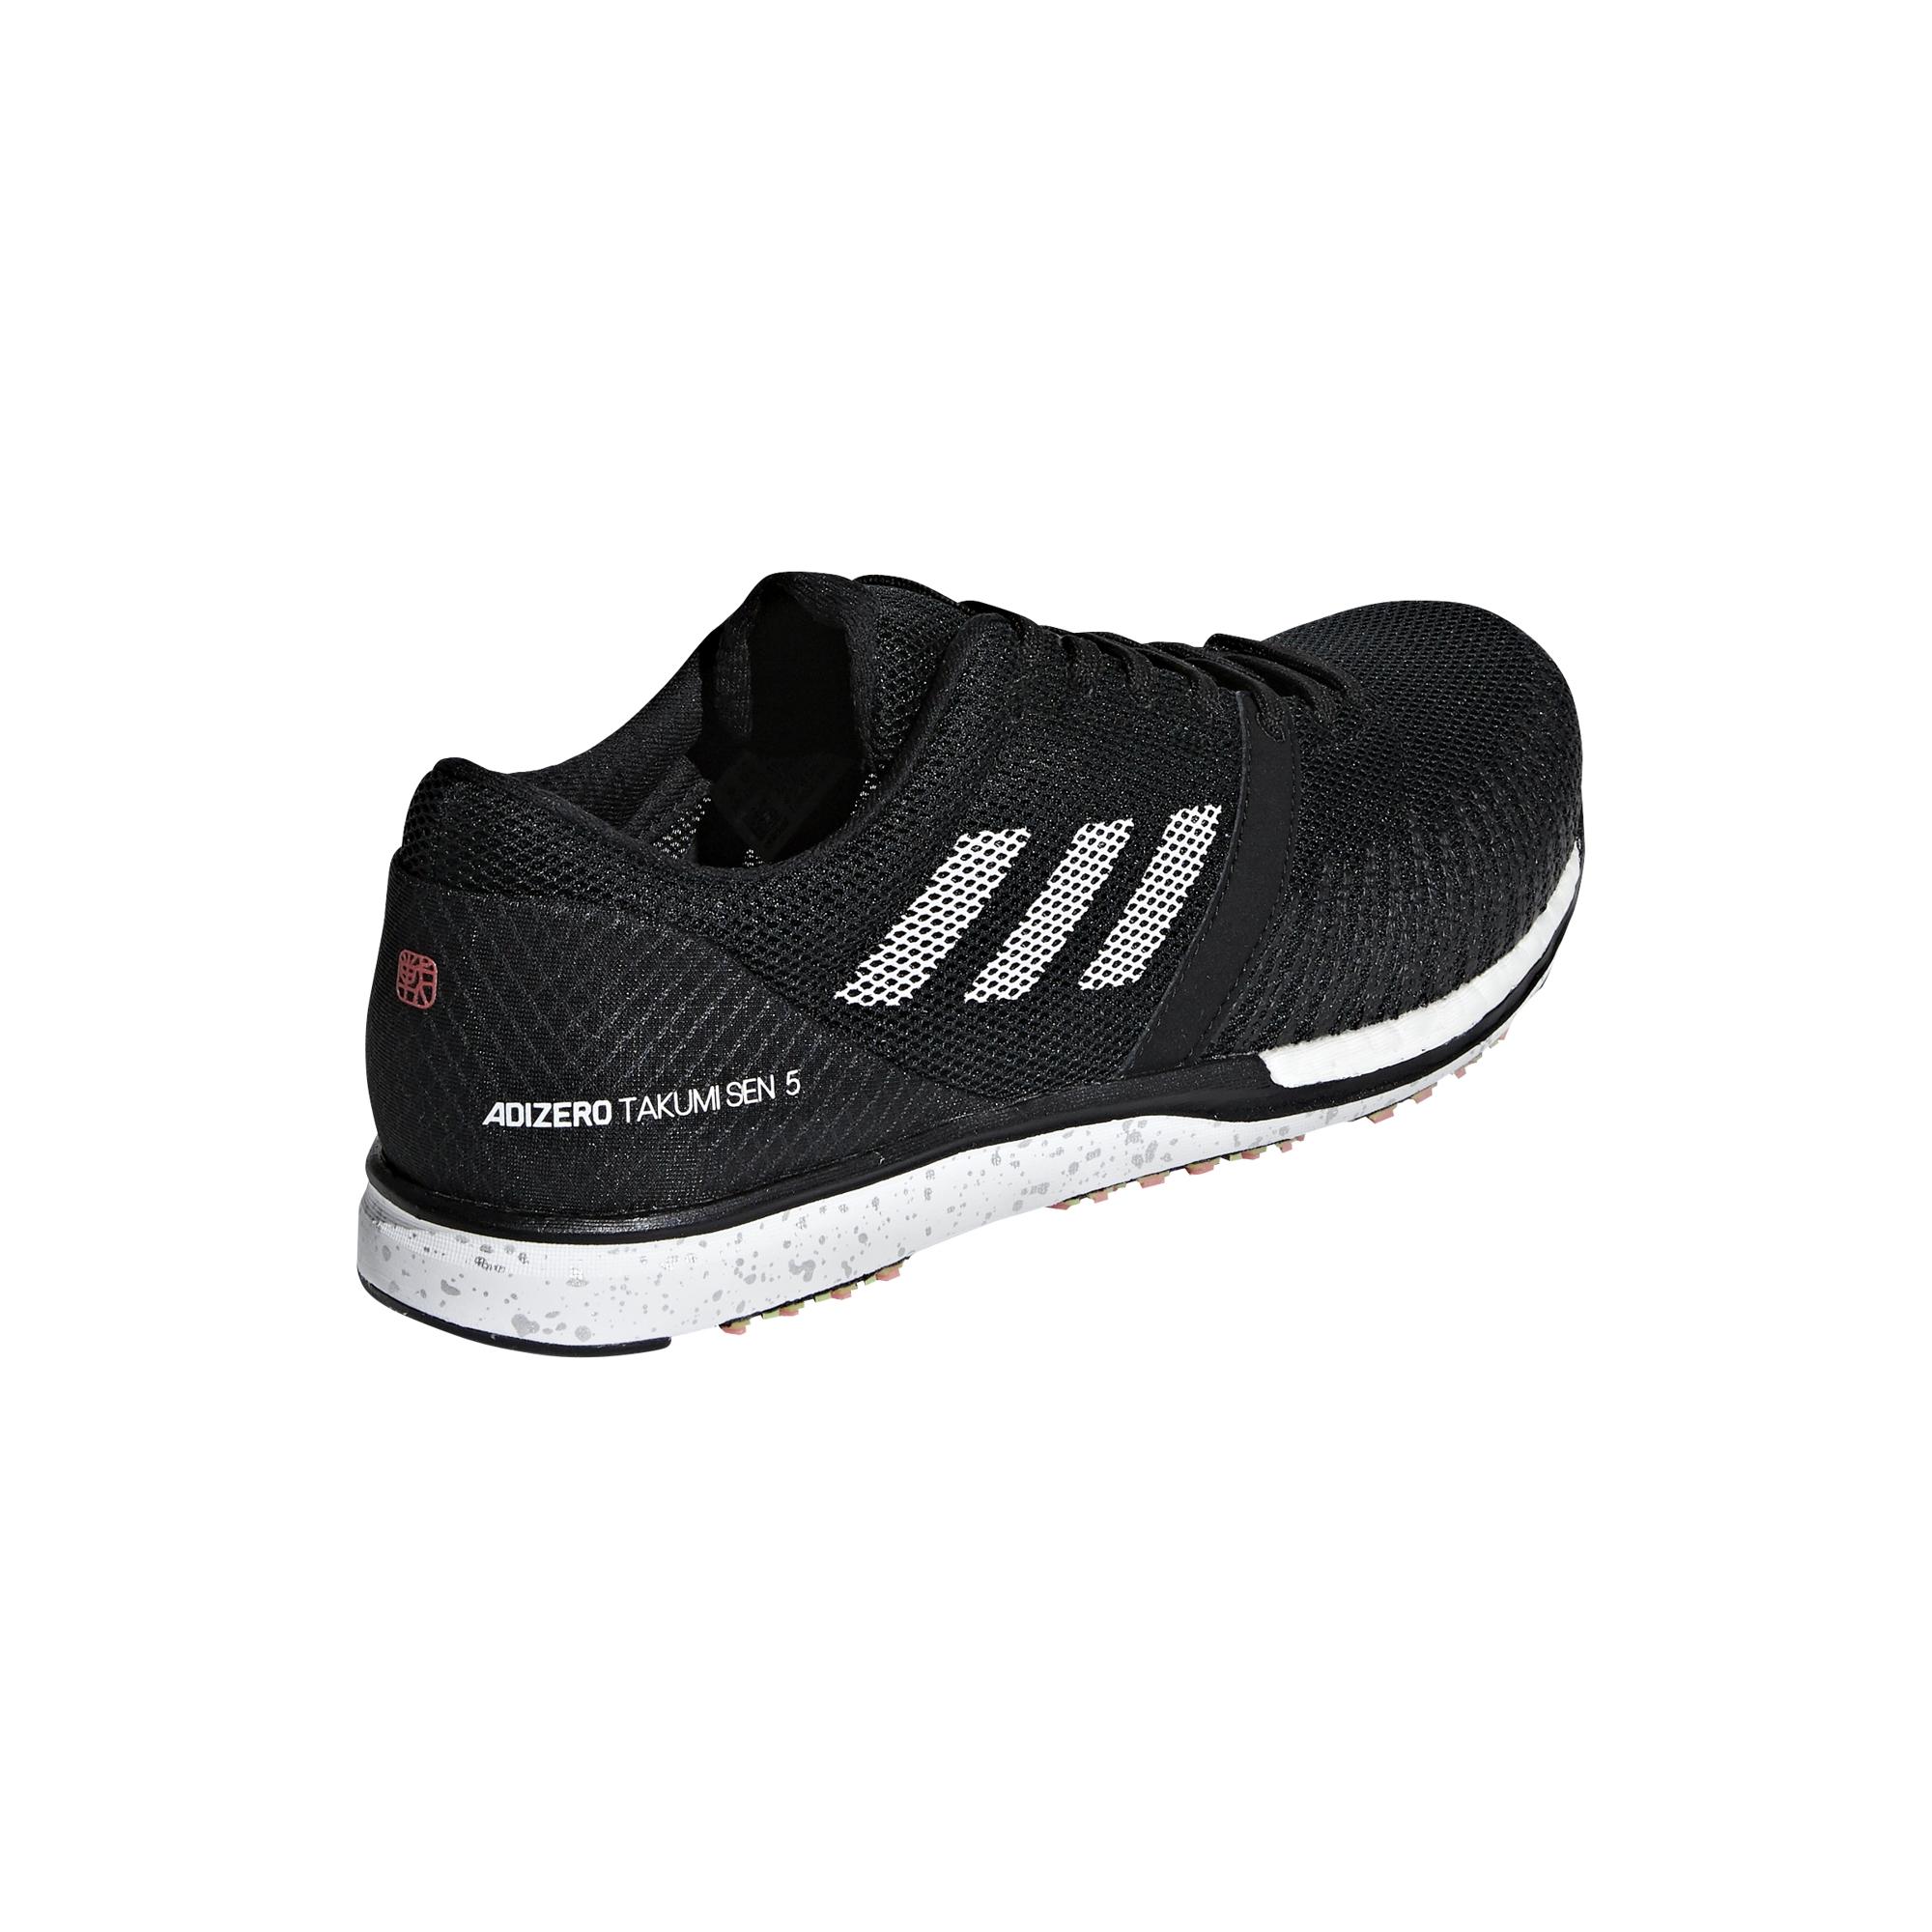 Chaussures adidas Adizero Takumi Sen 5  5d4ac7195